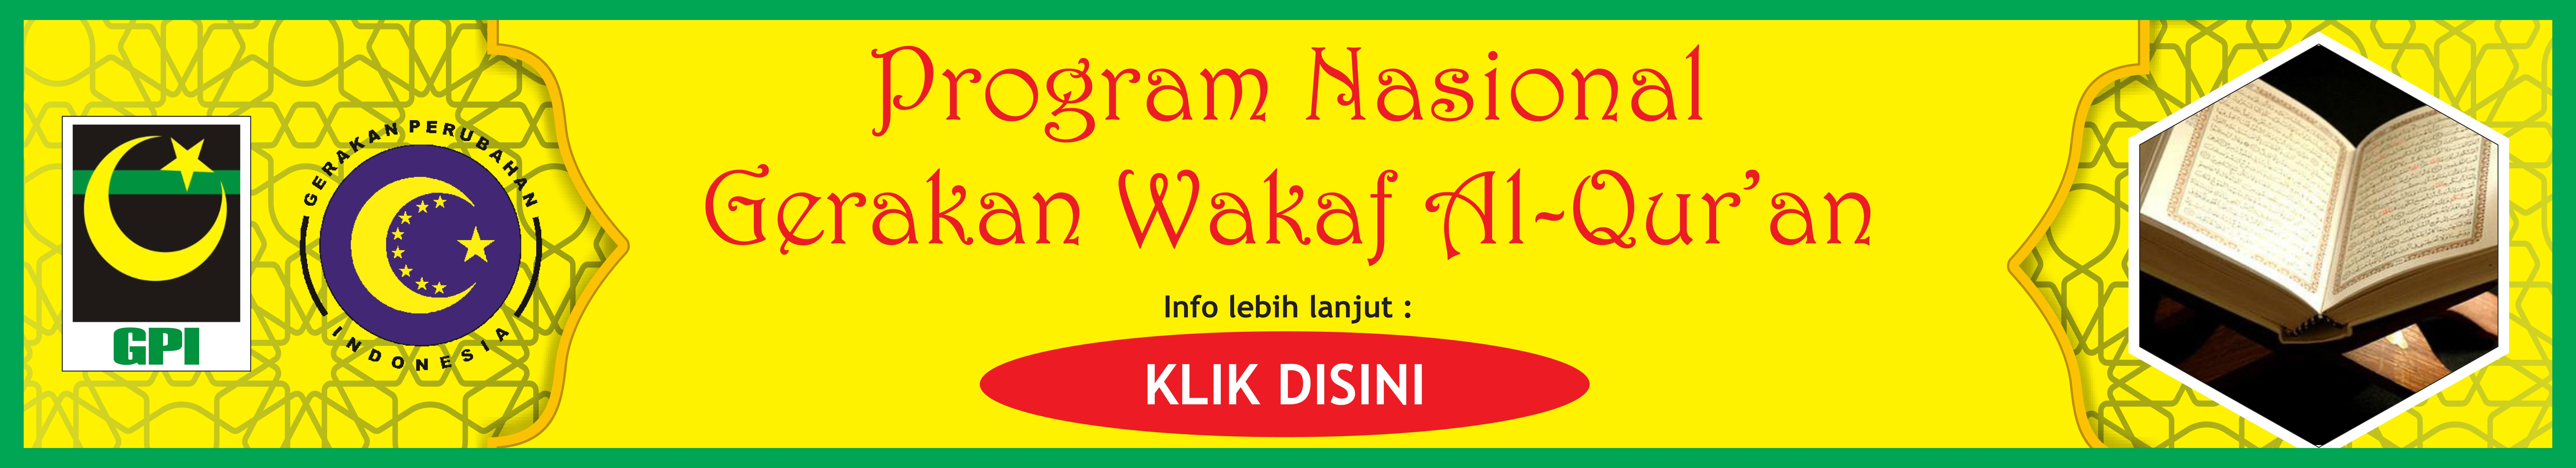 1100 x 200 Program Nasional Gerakan Wakaf Al-Quran GPI